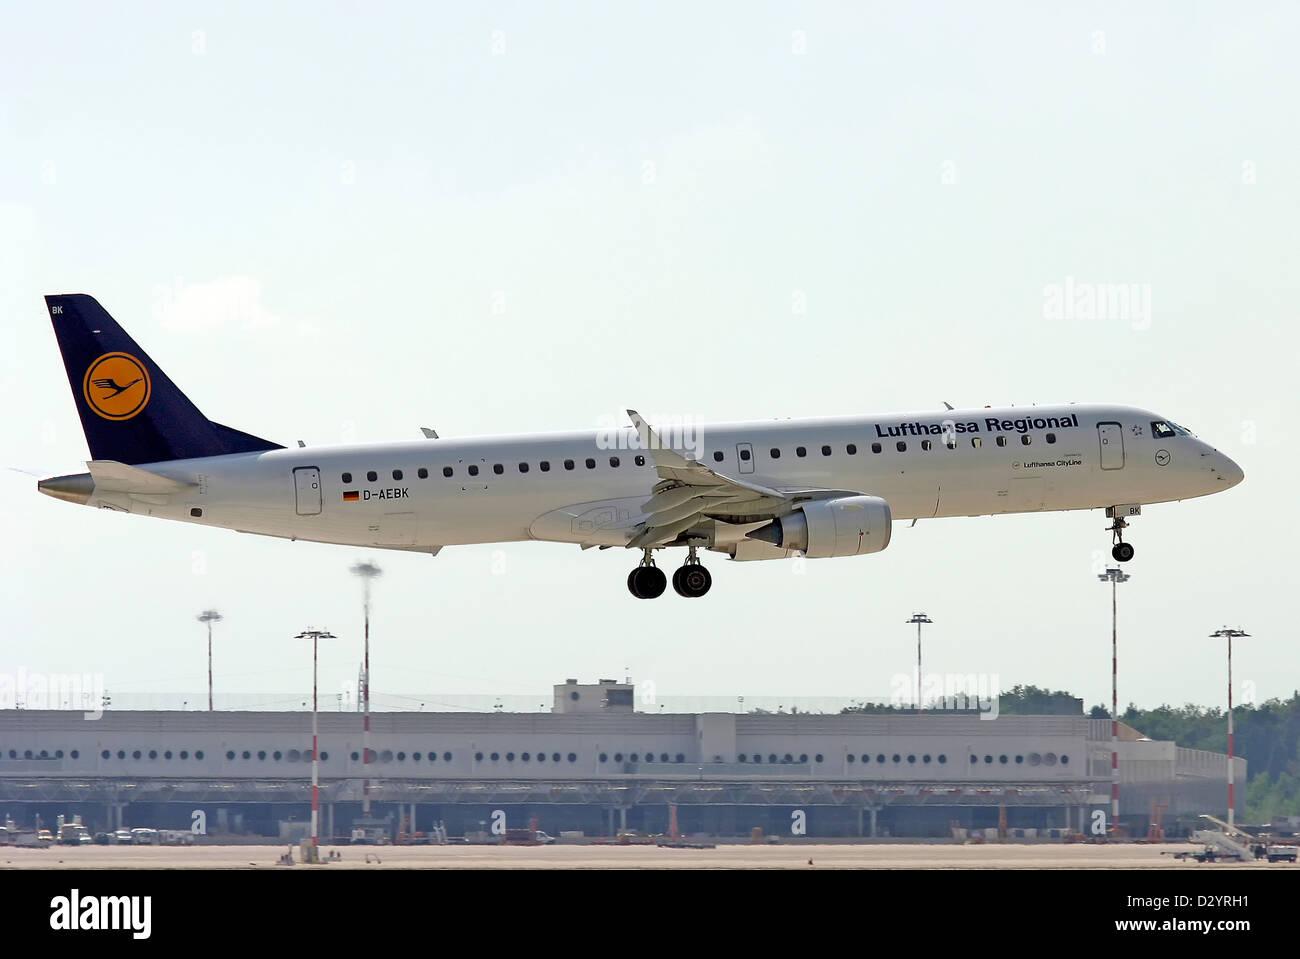 Lufthansa Regional, Embraer ERJ190-200LR - Stock Image